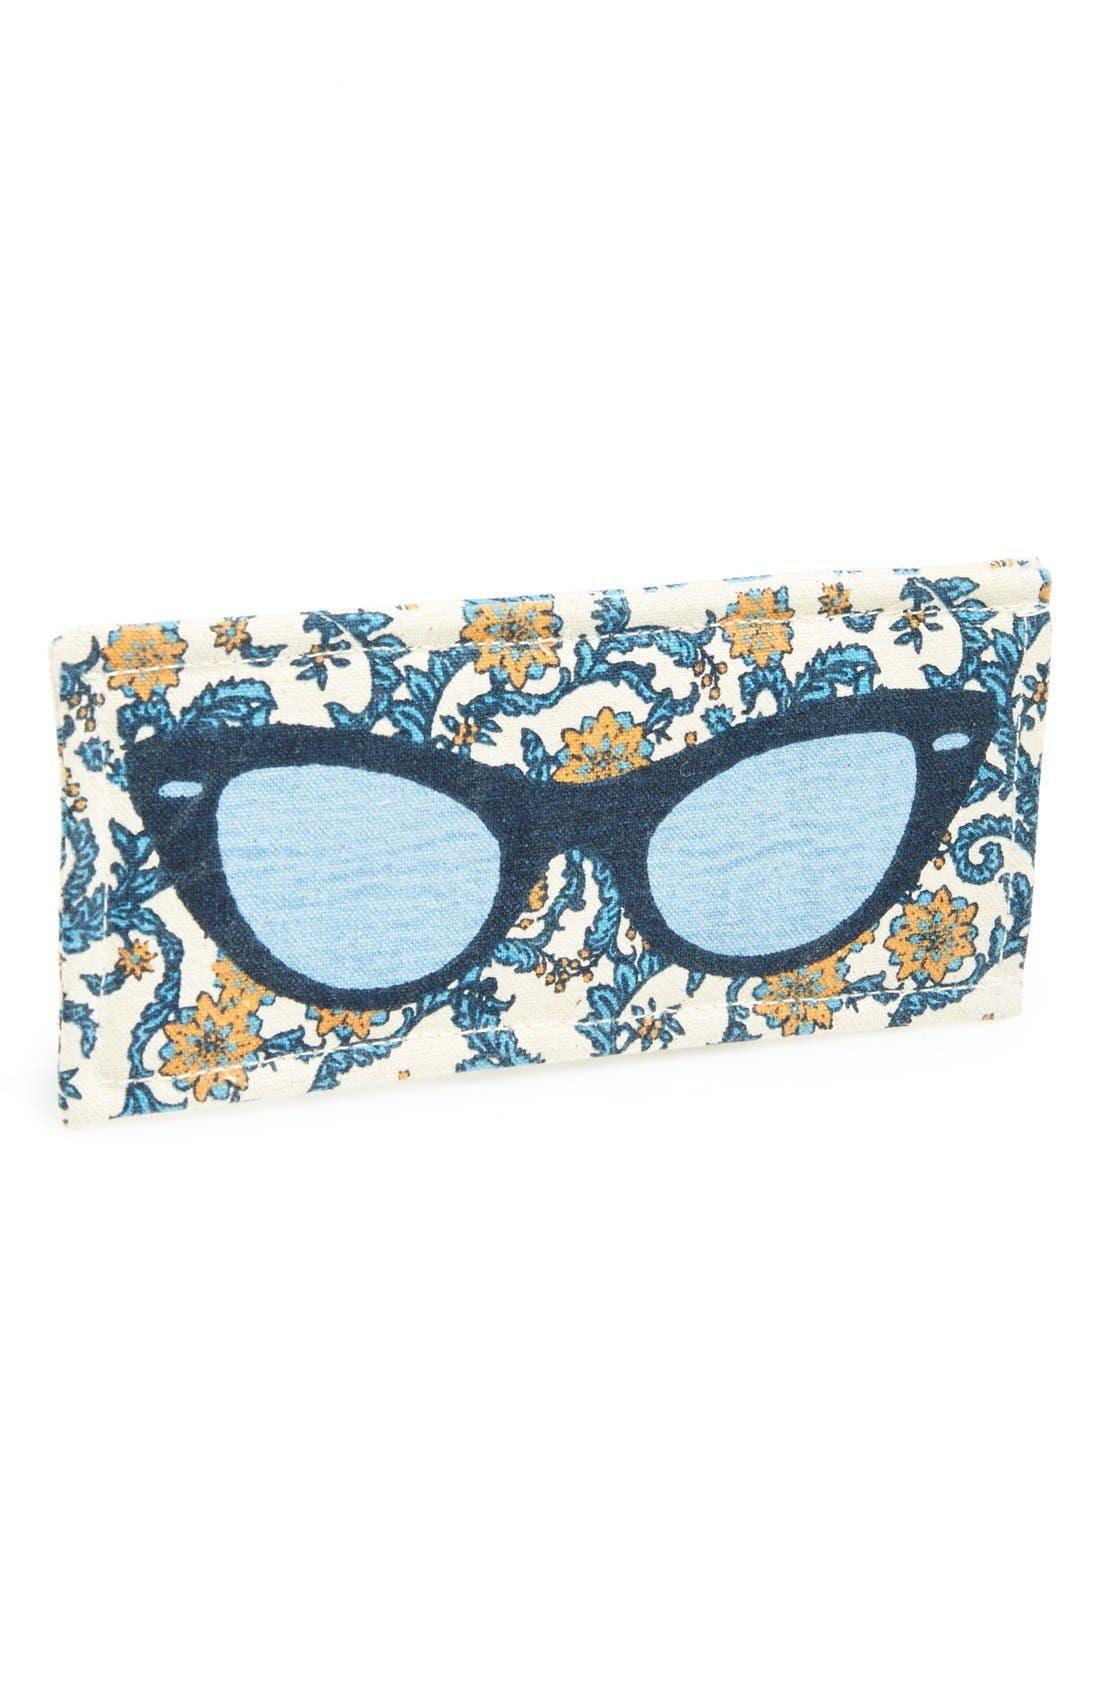 Main Image - Thomas Paul 'Lucy' Sunglasses Case